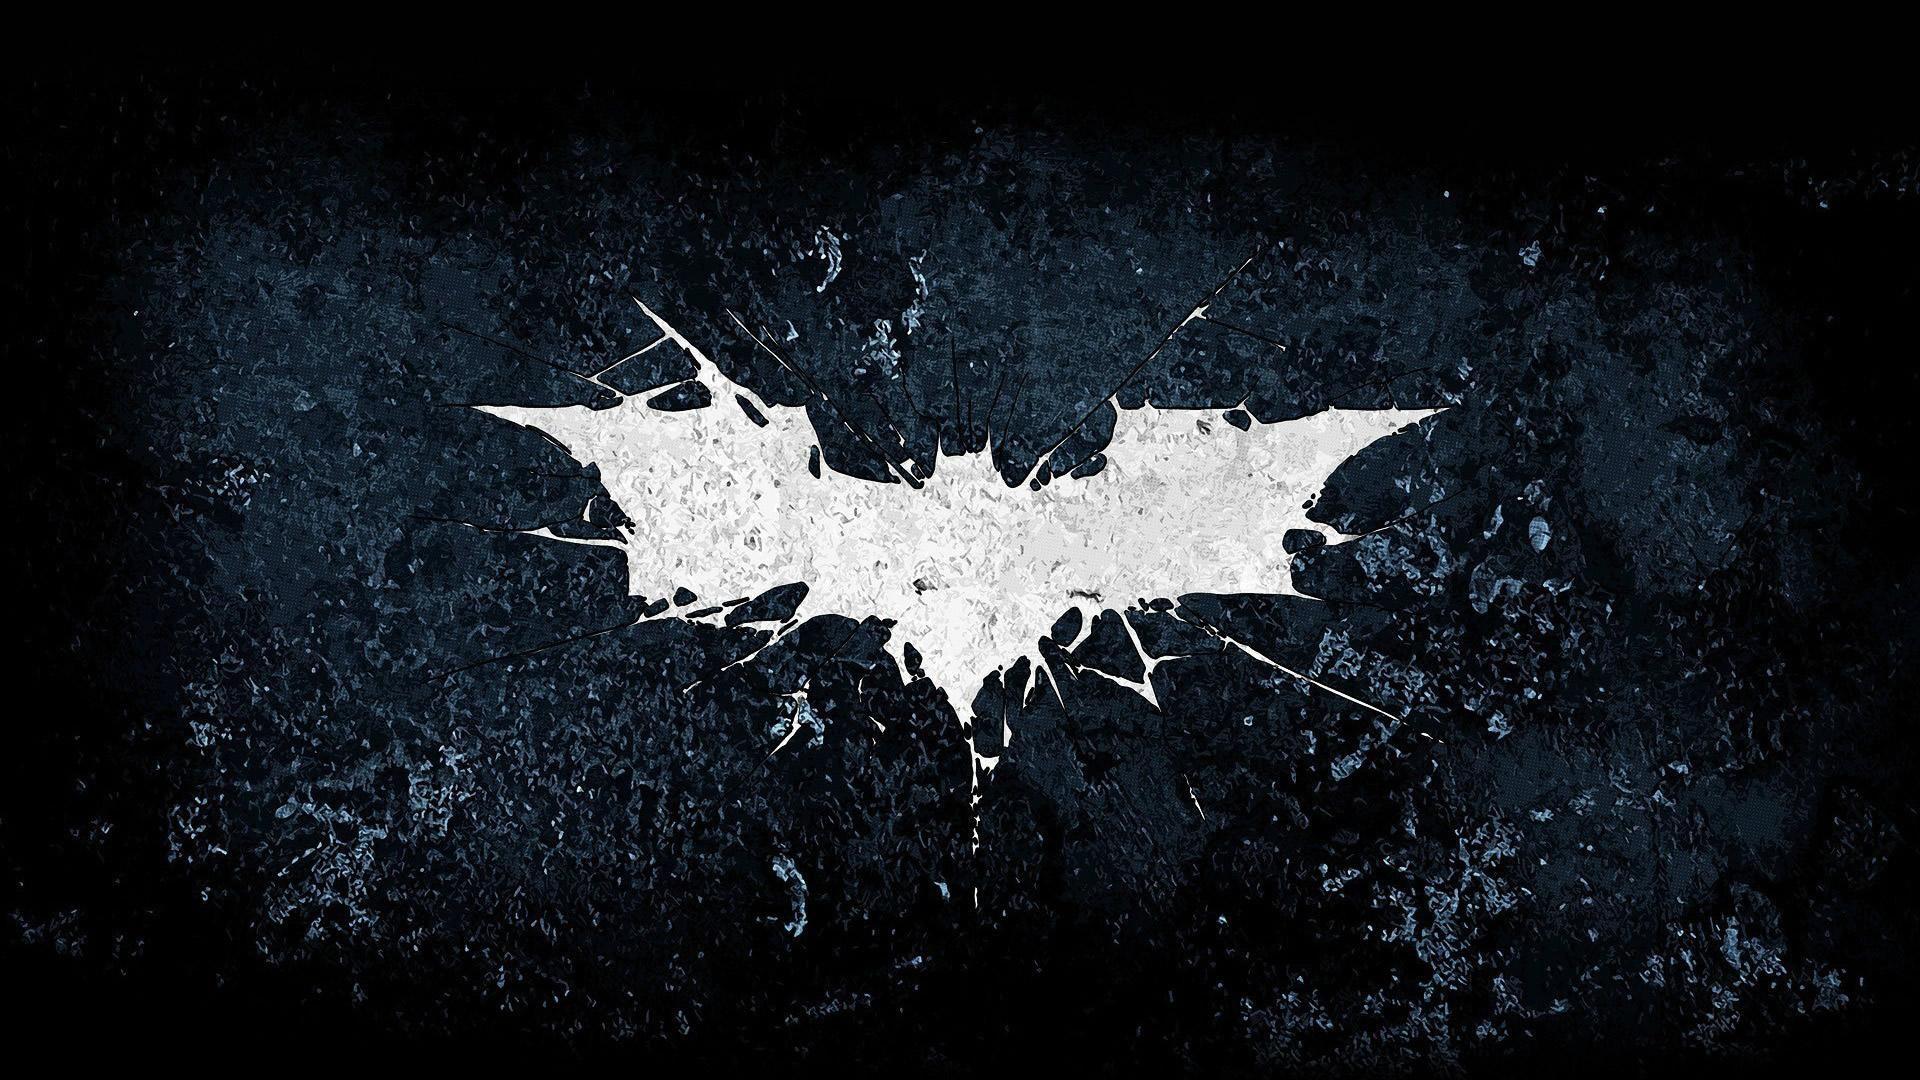 Batman Sign 1080p Hd Wallpaper Widescreen With Images Dark Knight Wallpaper Dark Wallpaper Black Hd Wallpaper